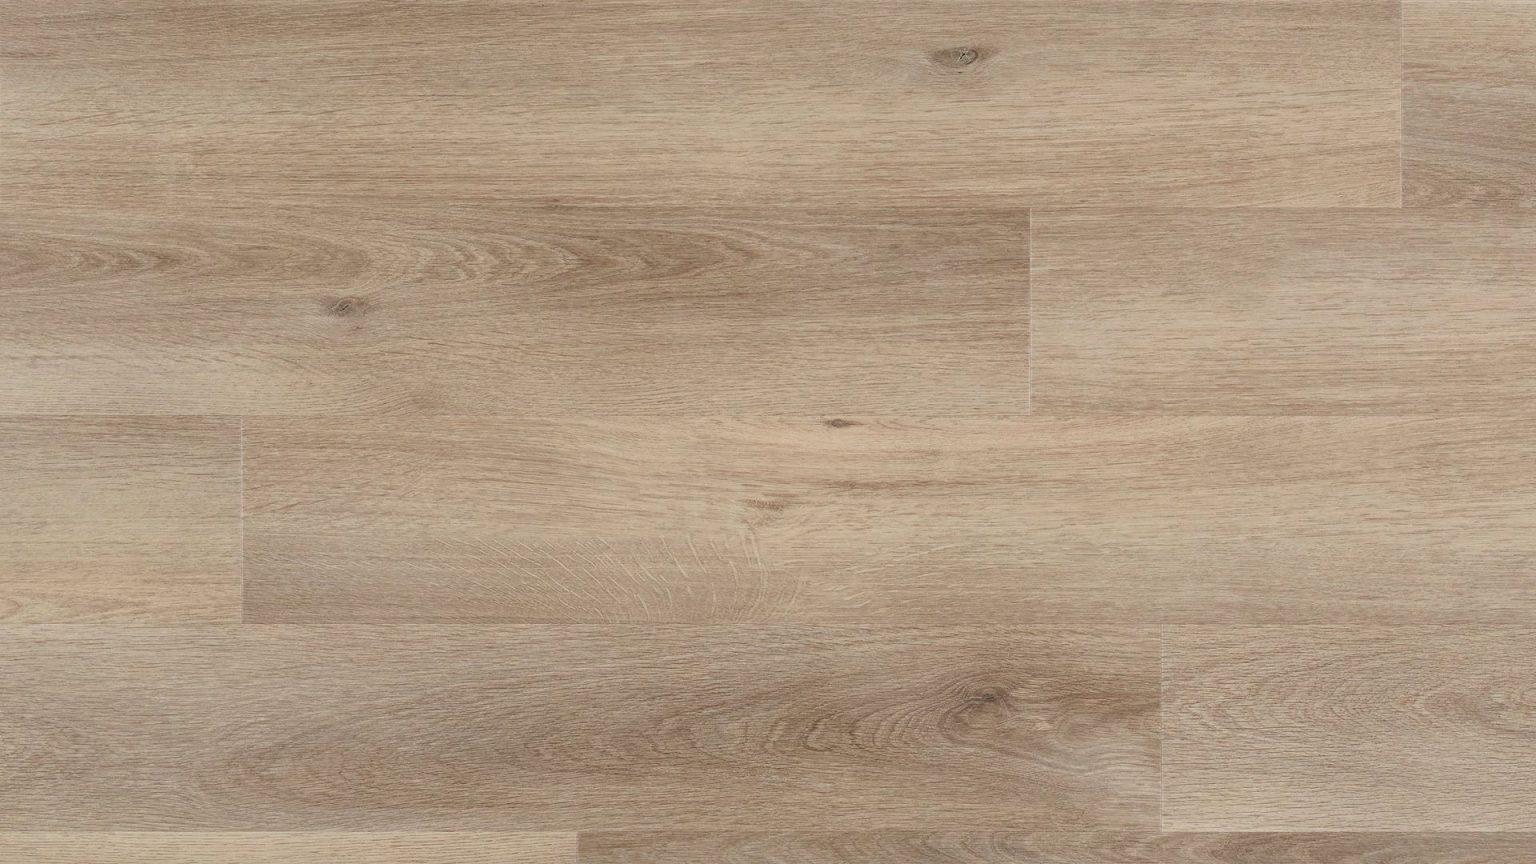 Kingston 50 LVRE 136 / COREtec® authentics wood